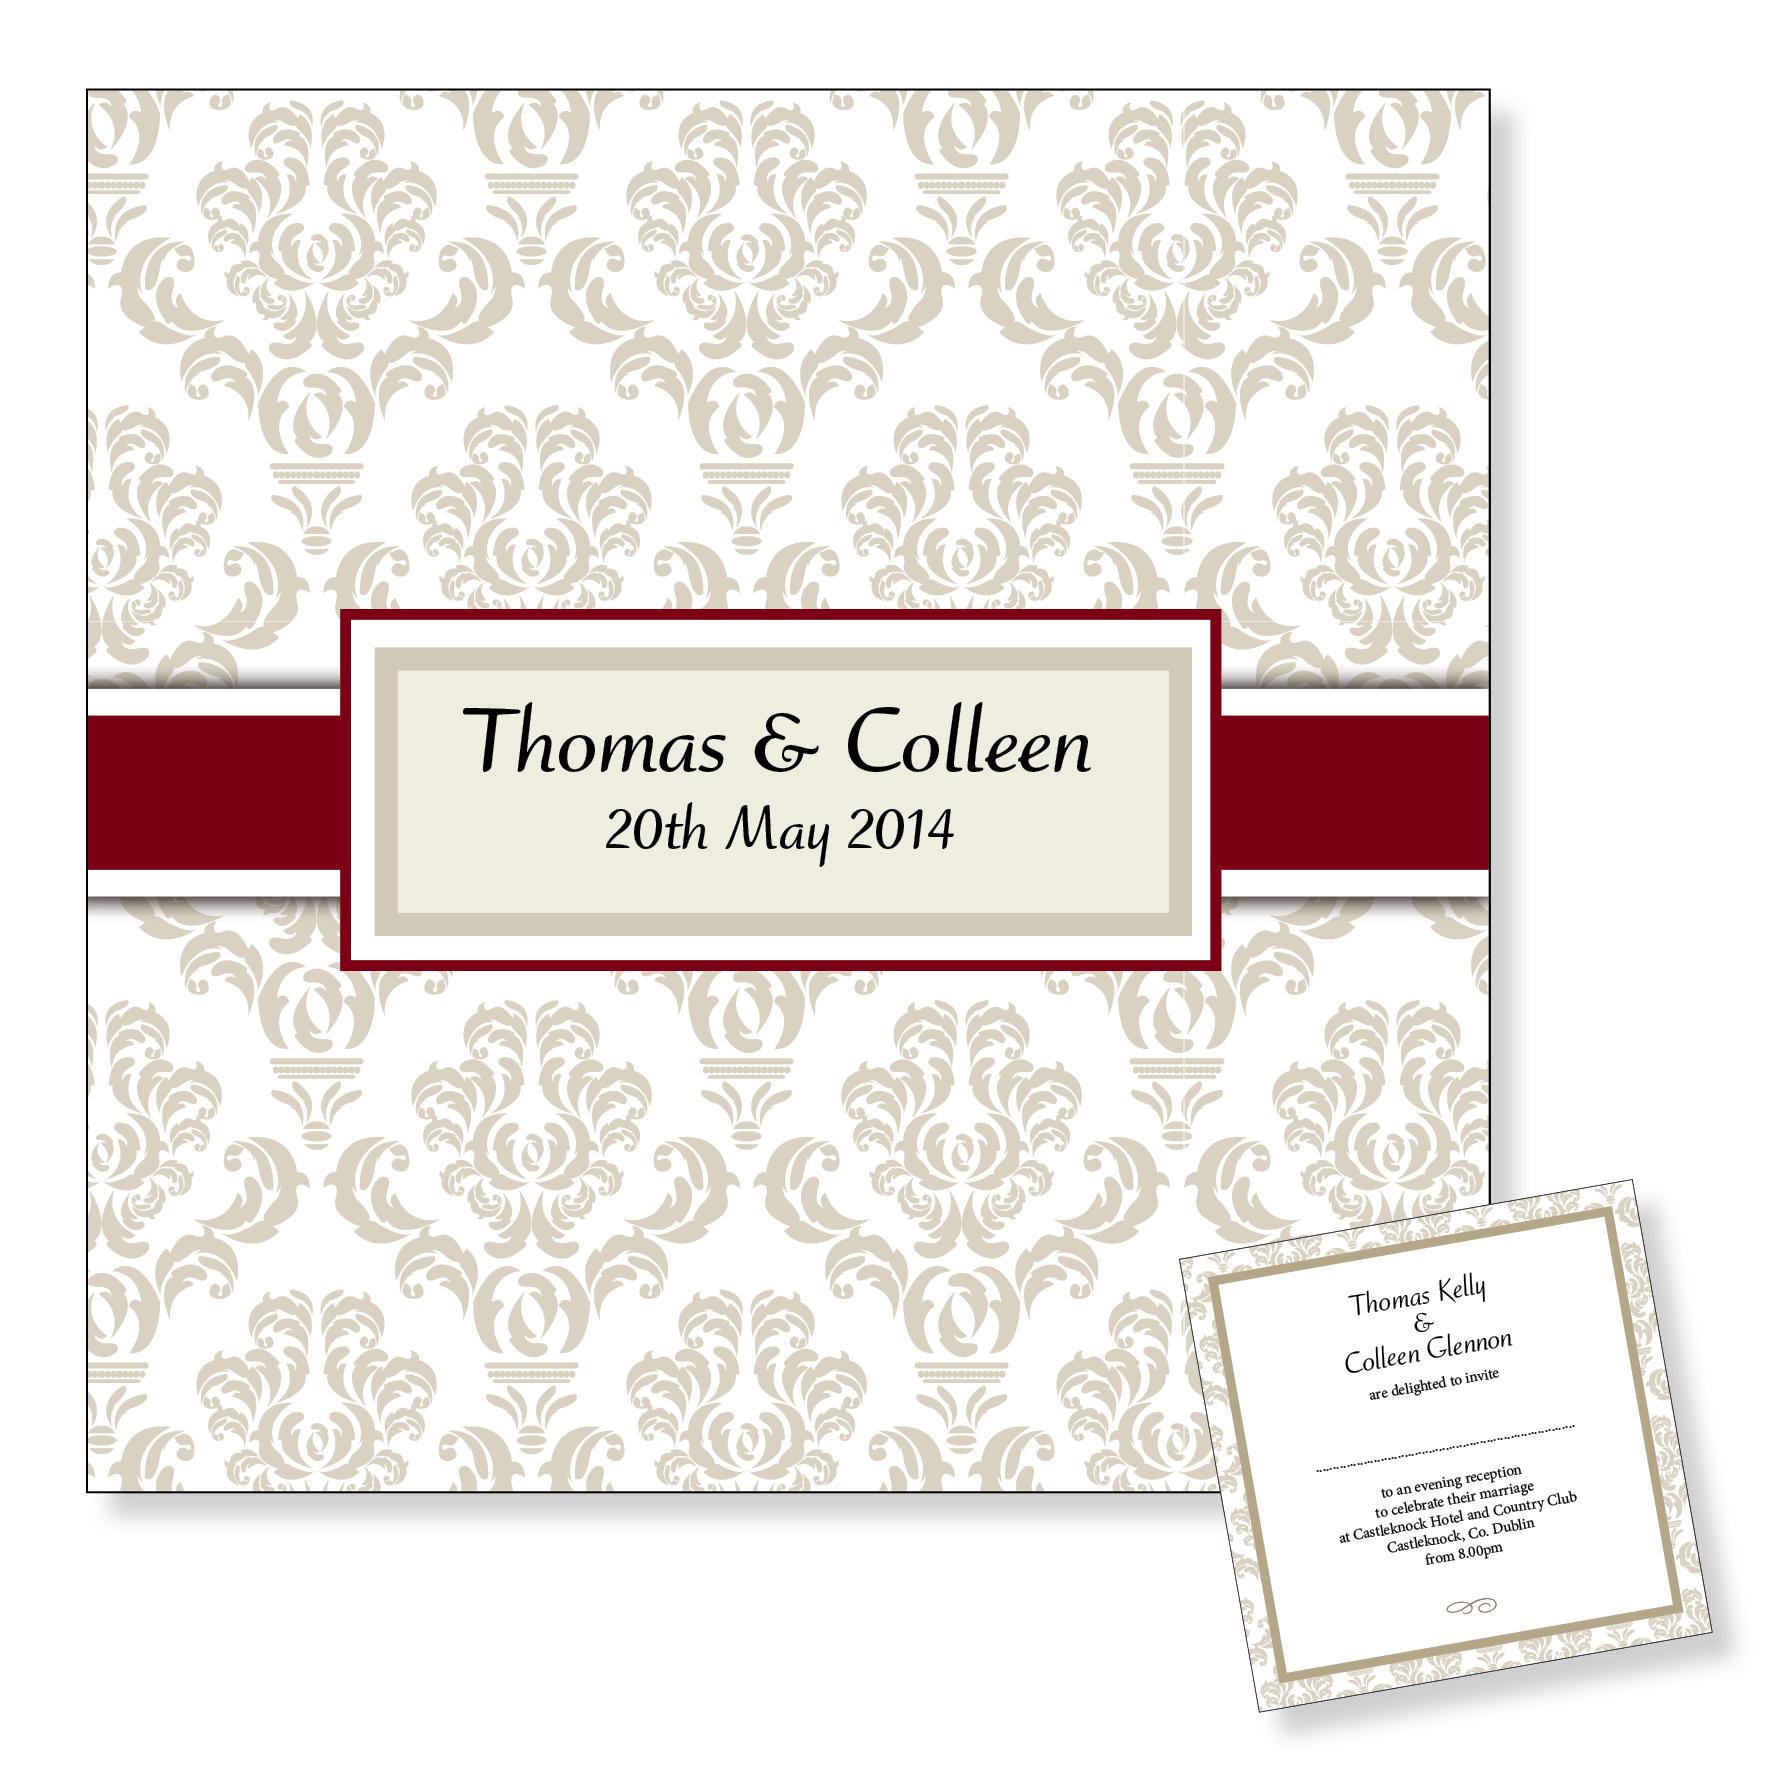 Evening wedding invitation - Classic style